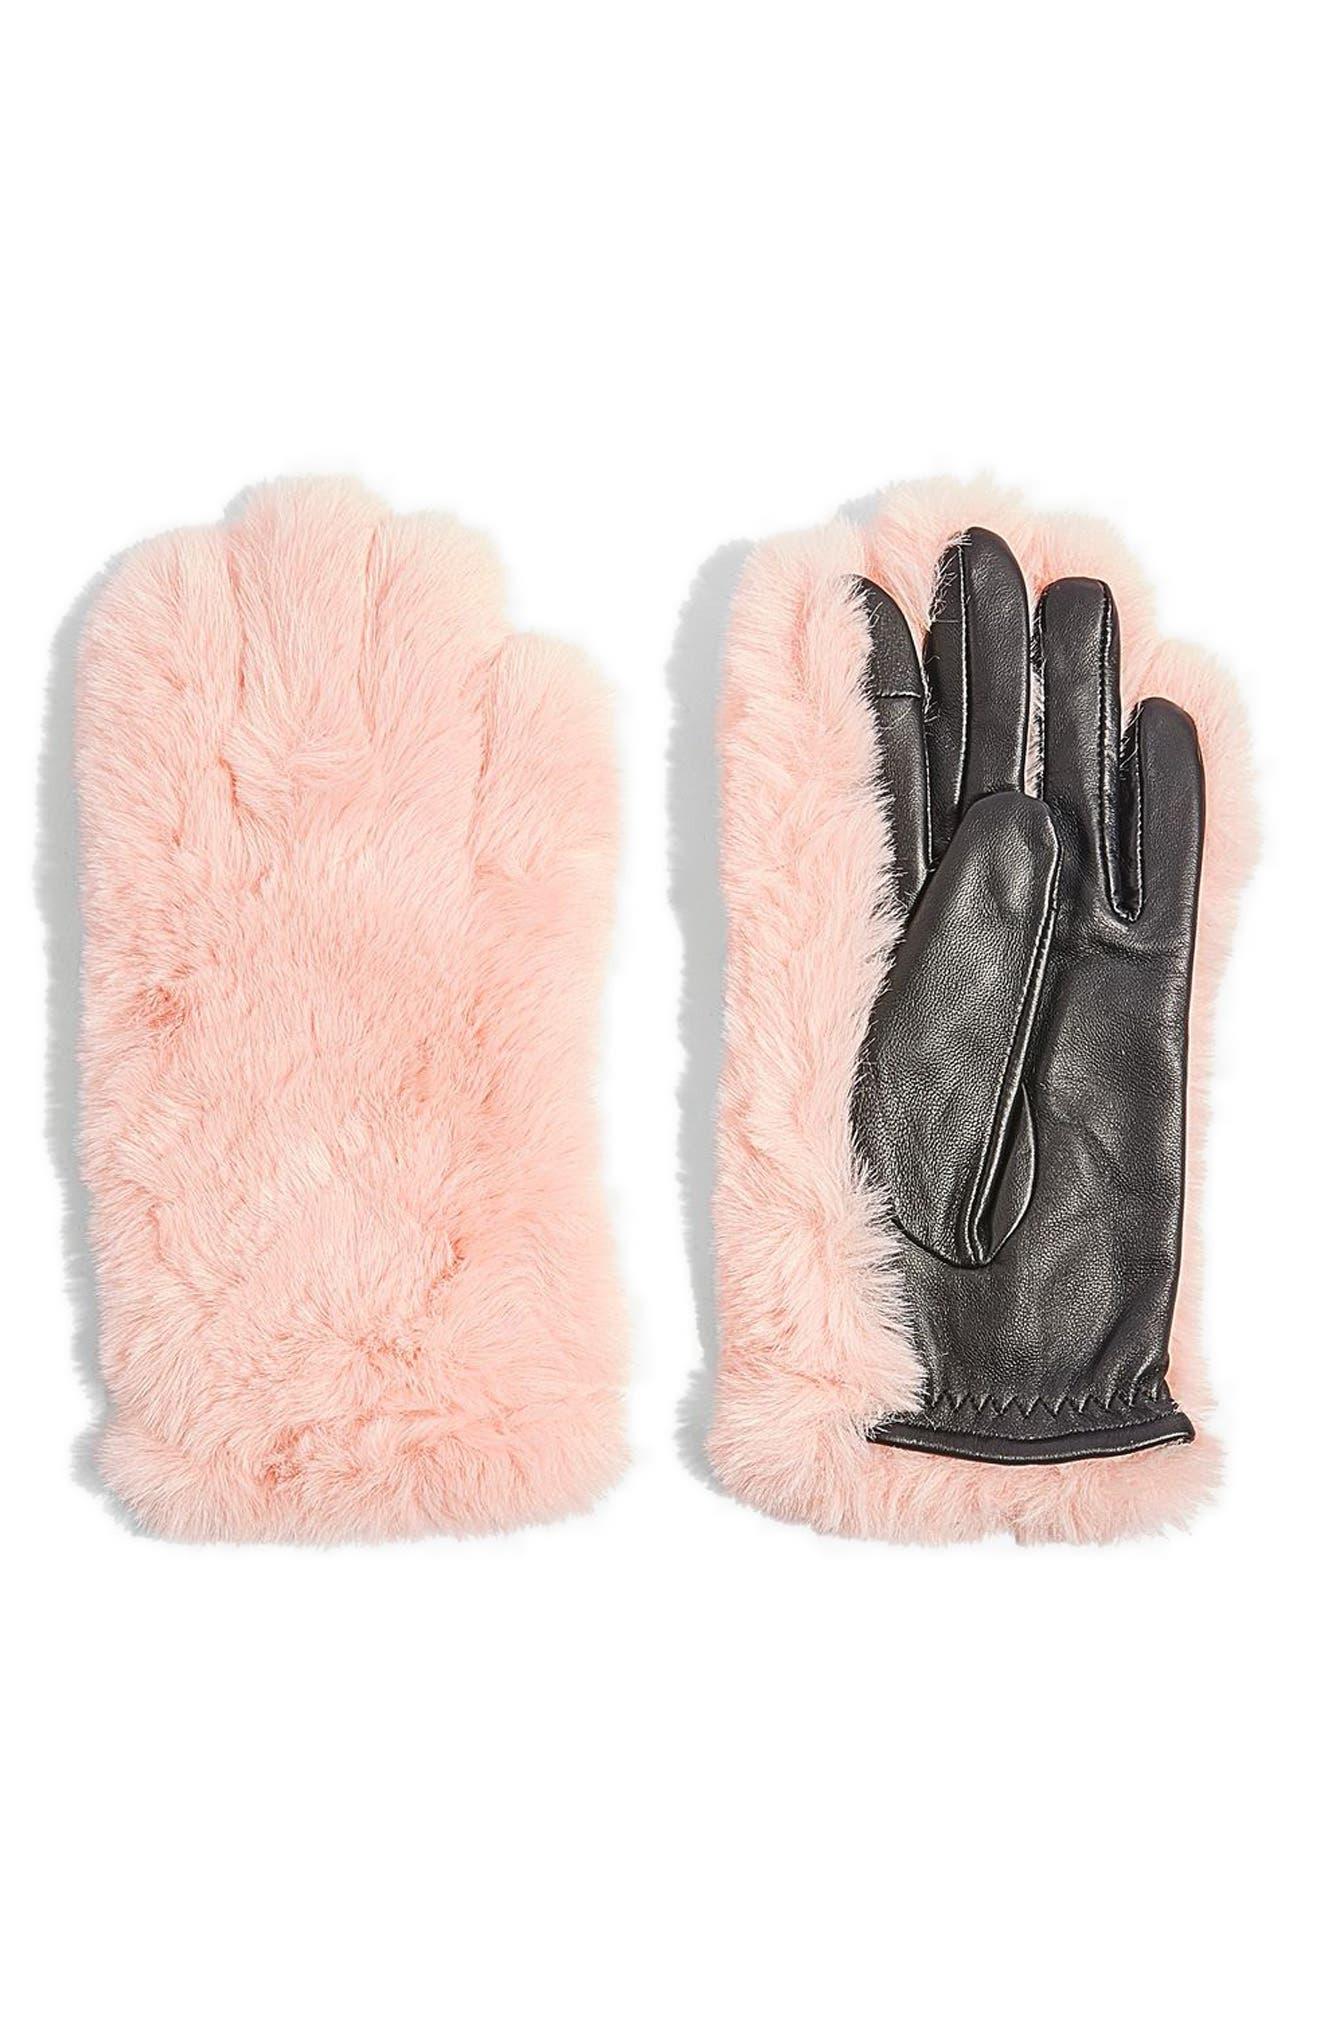 Main Image - Topshop Faux Fur & Leather Gloves